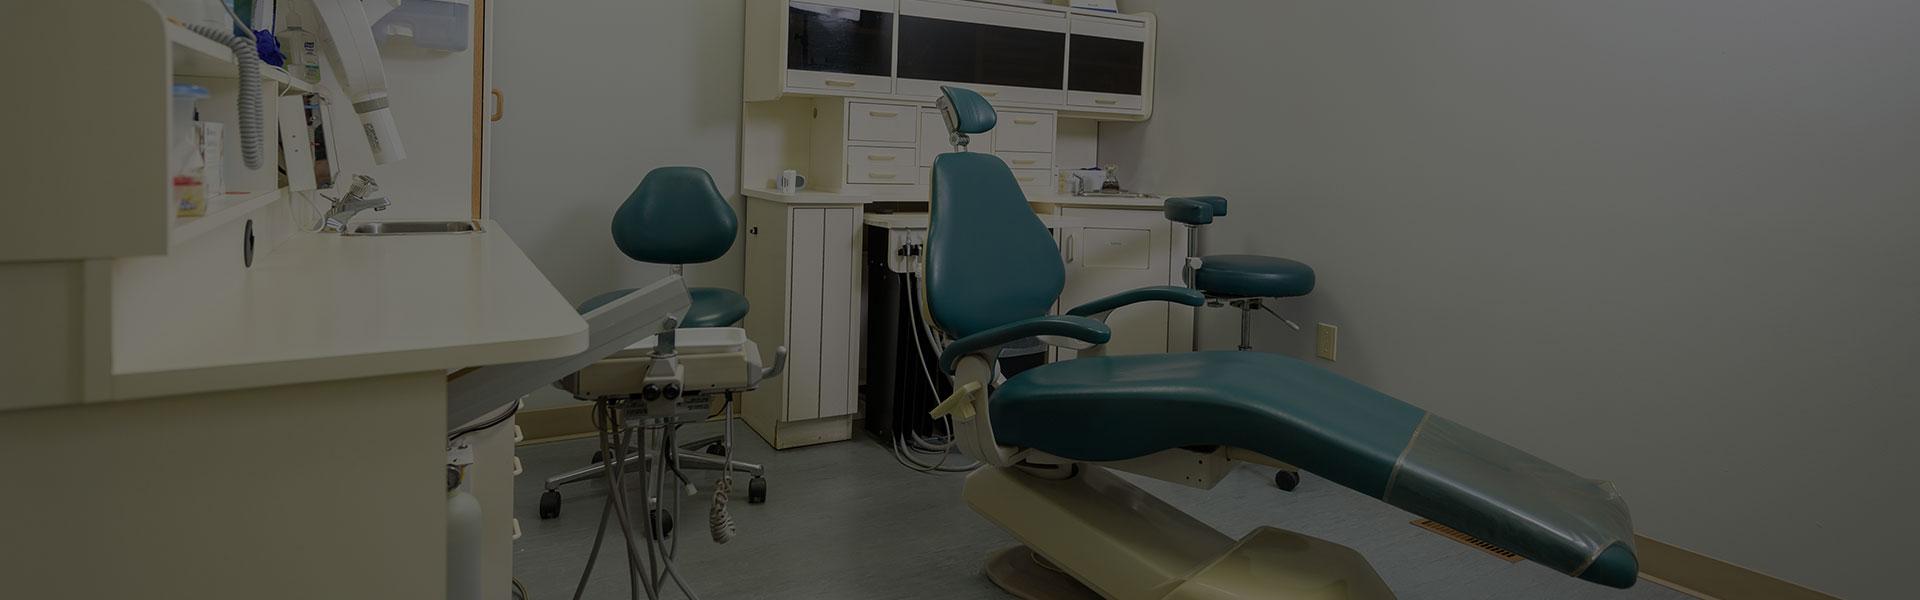 alliance dental coldbrook clinic